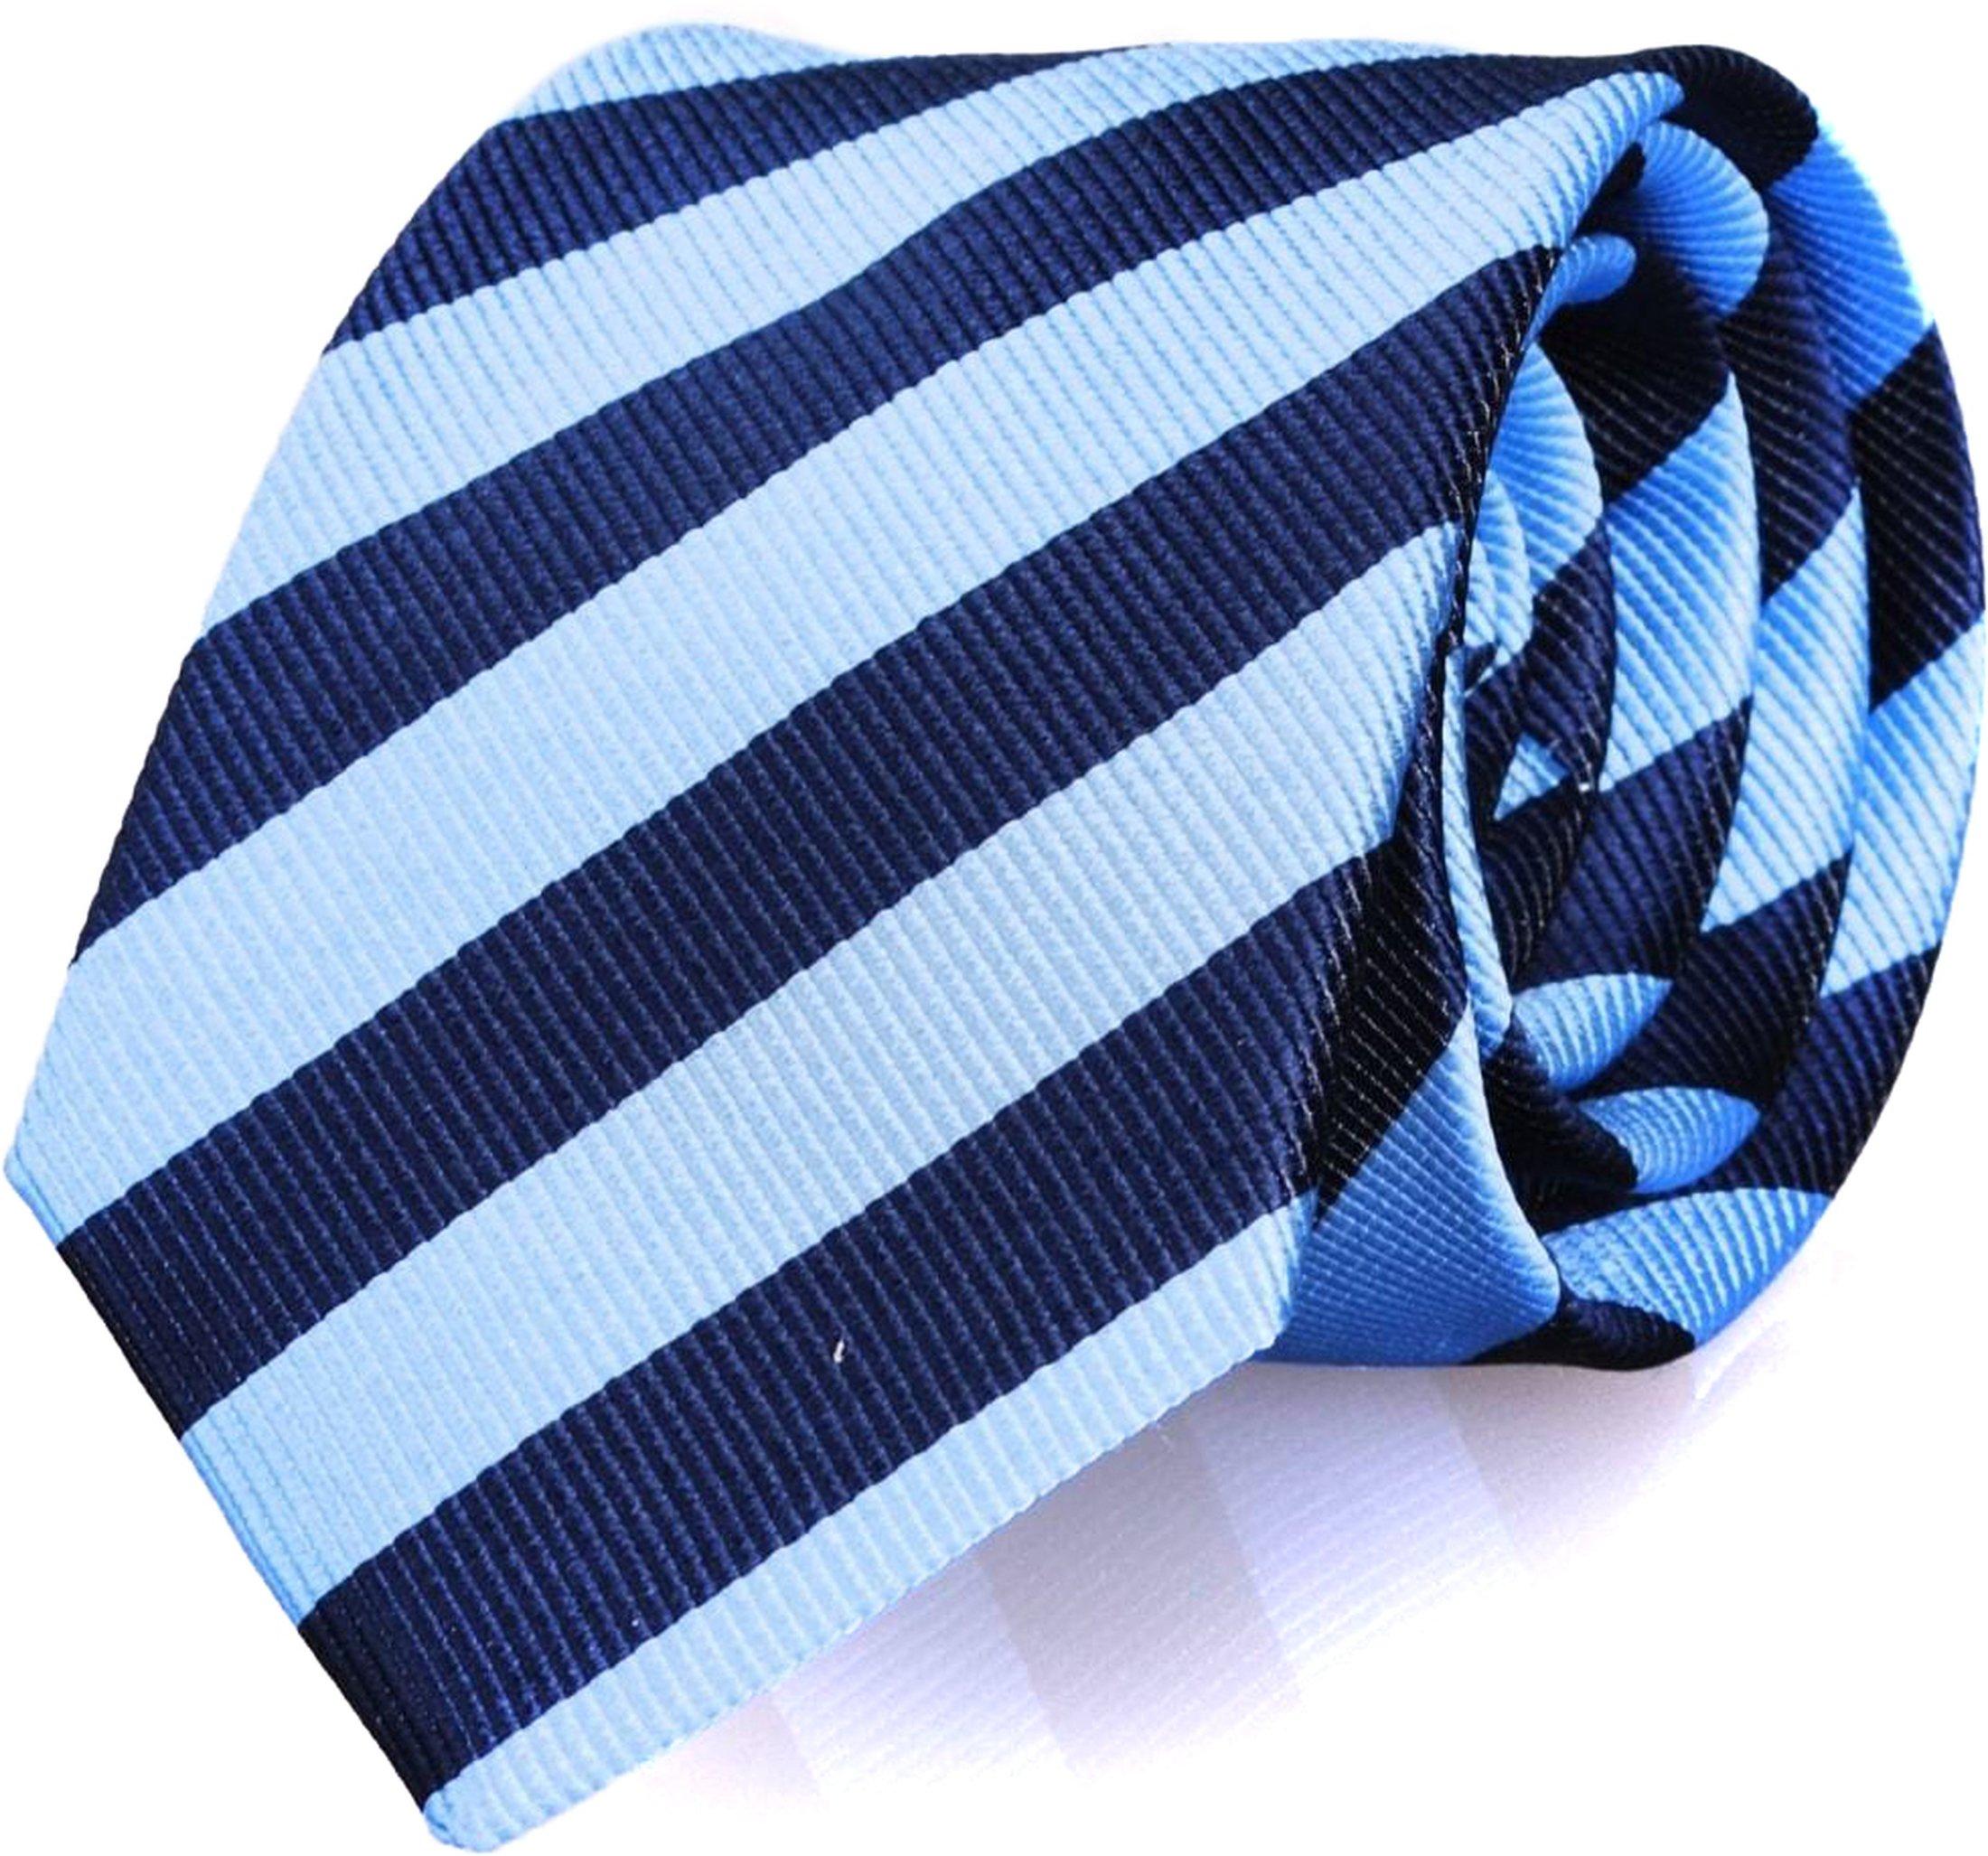 Krawatte Seide Blau Streifen FD13 Foto 0